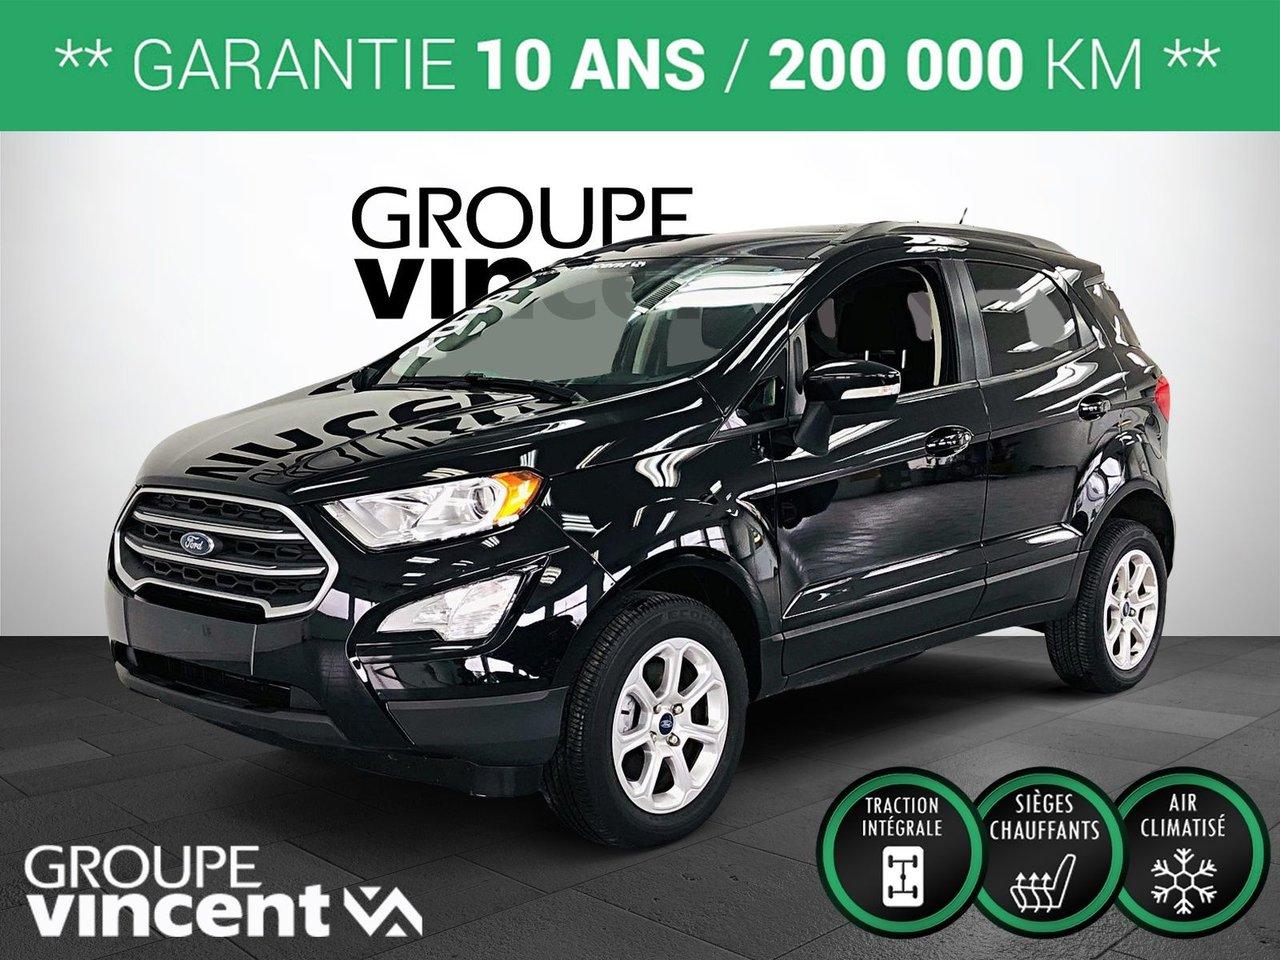 Ford EcoSport 2019 SE AWD ** GARANTIE 10 ANS **